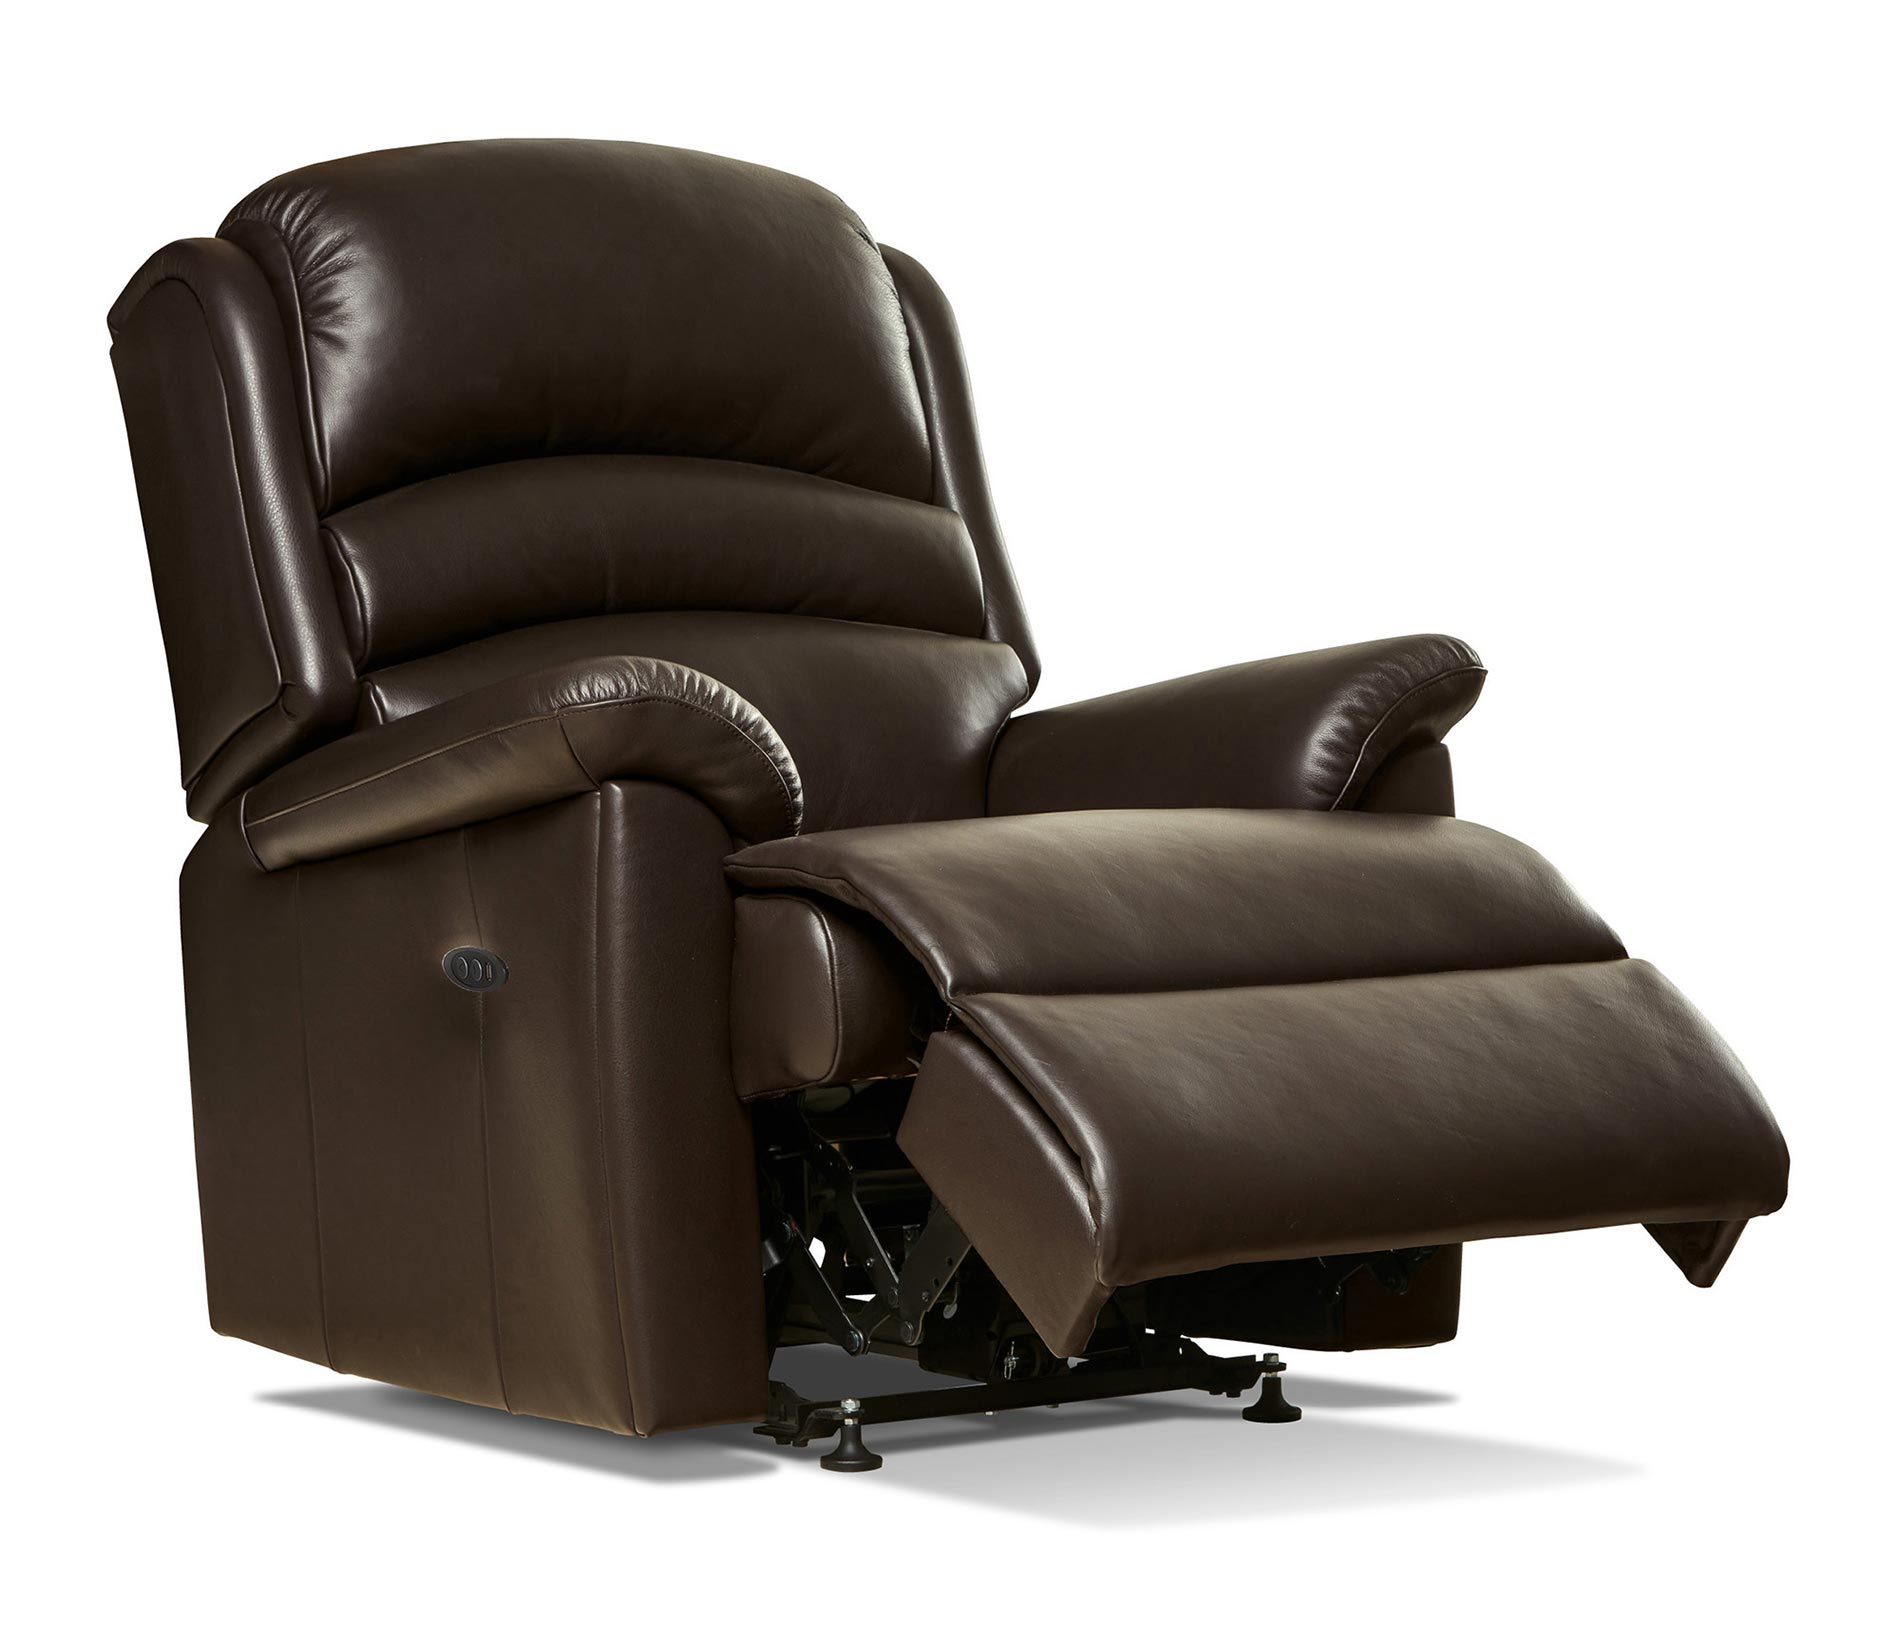 Olivia Standard Leather Recliner Sherborne Upholstery